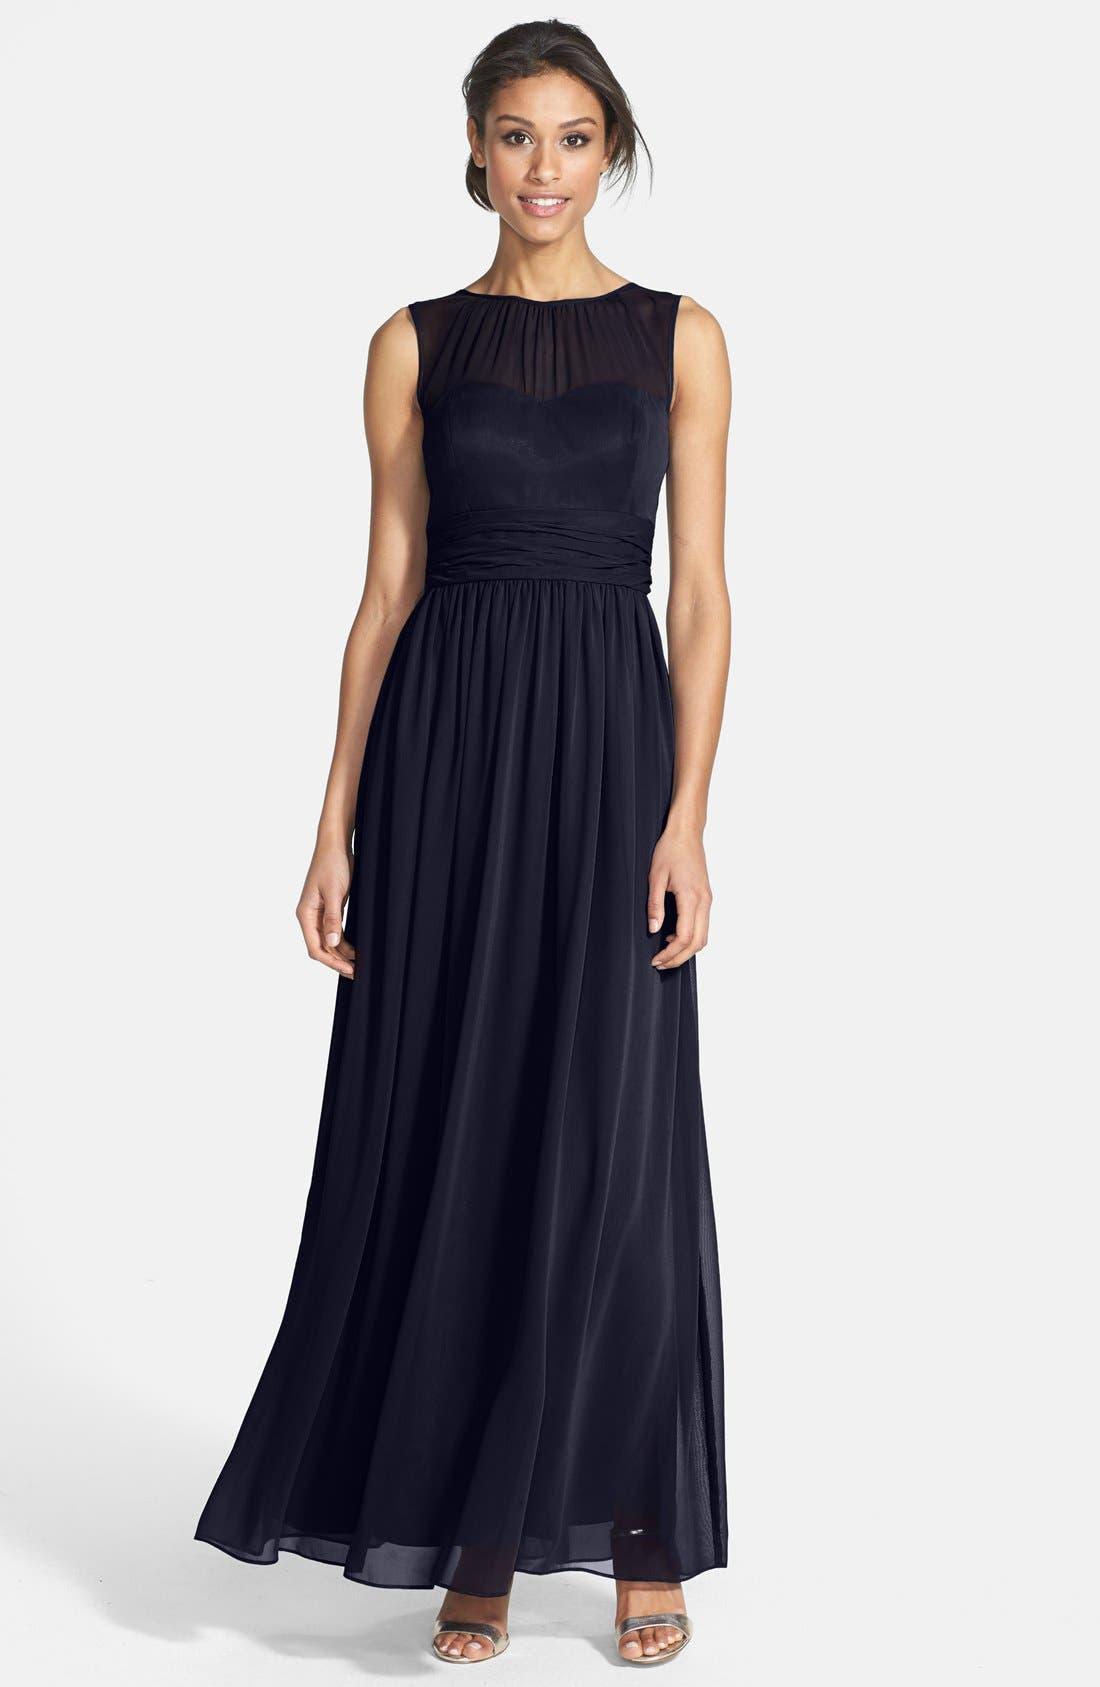 Alternate Image 1 Selected - Eliza J Illusion Yoke Chiffon Gown